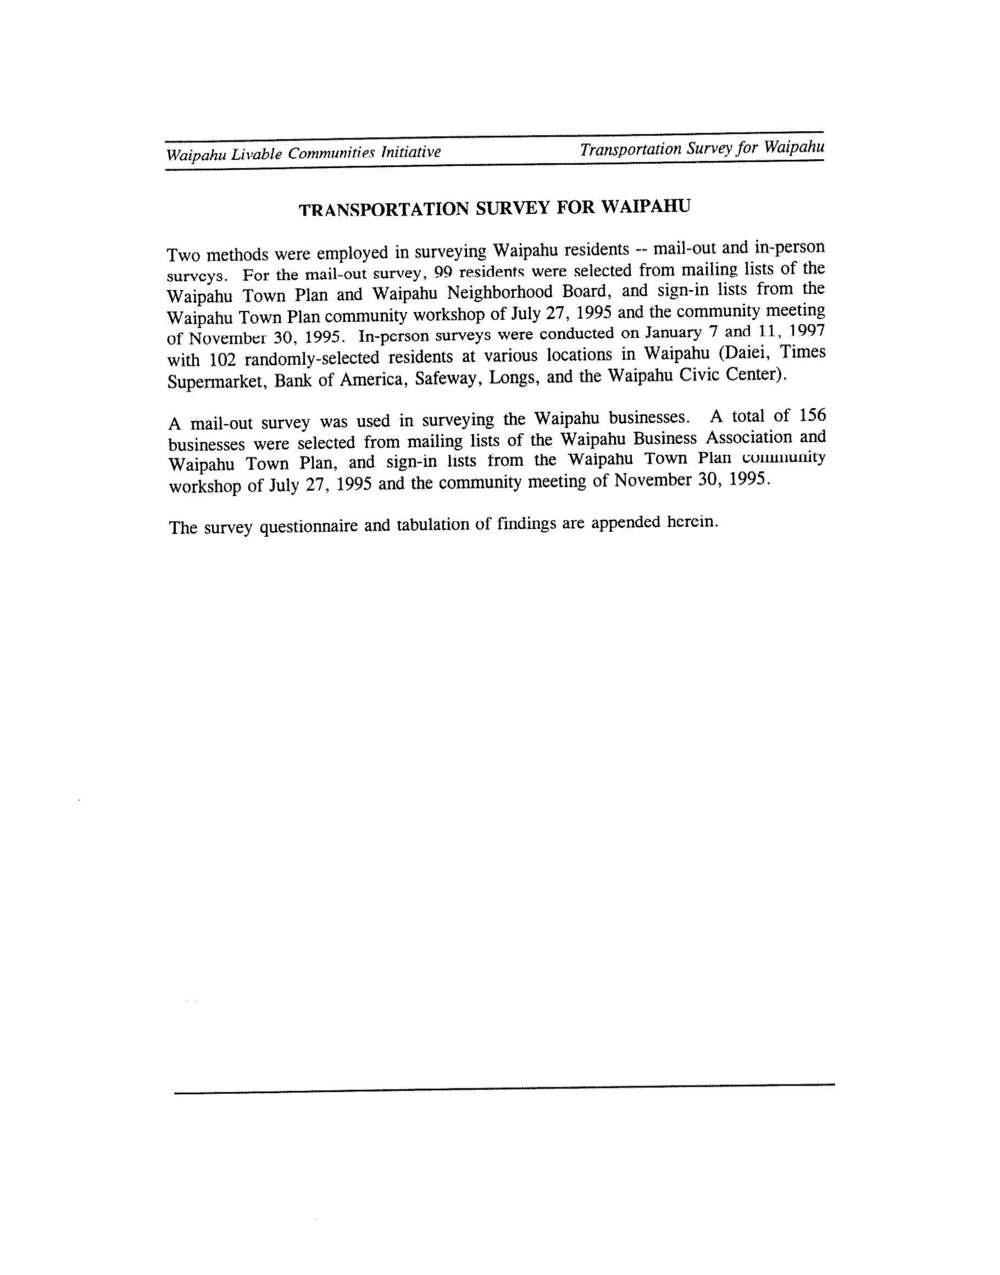 160531_WaipahuLivableCommunities(1998)_Page_159.jpg